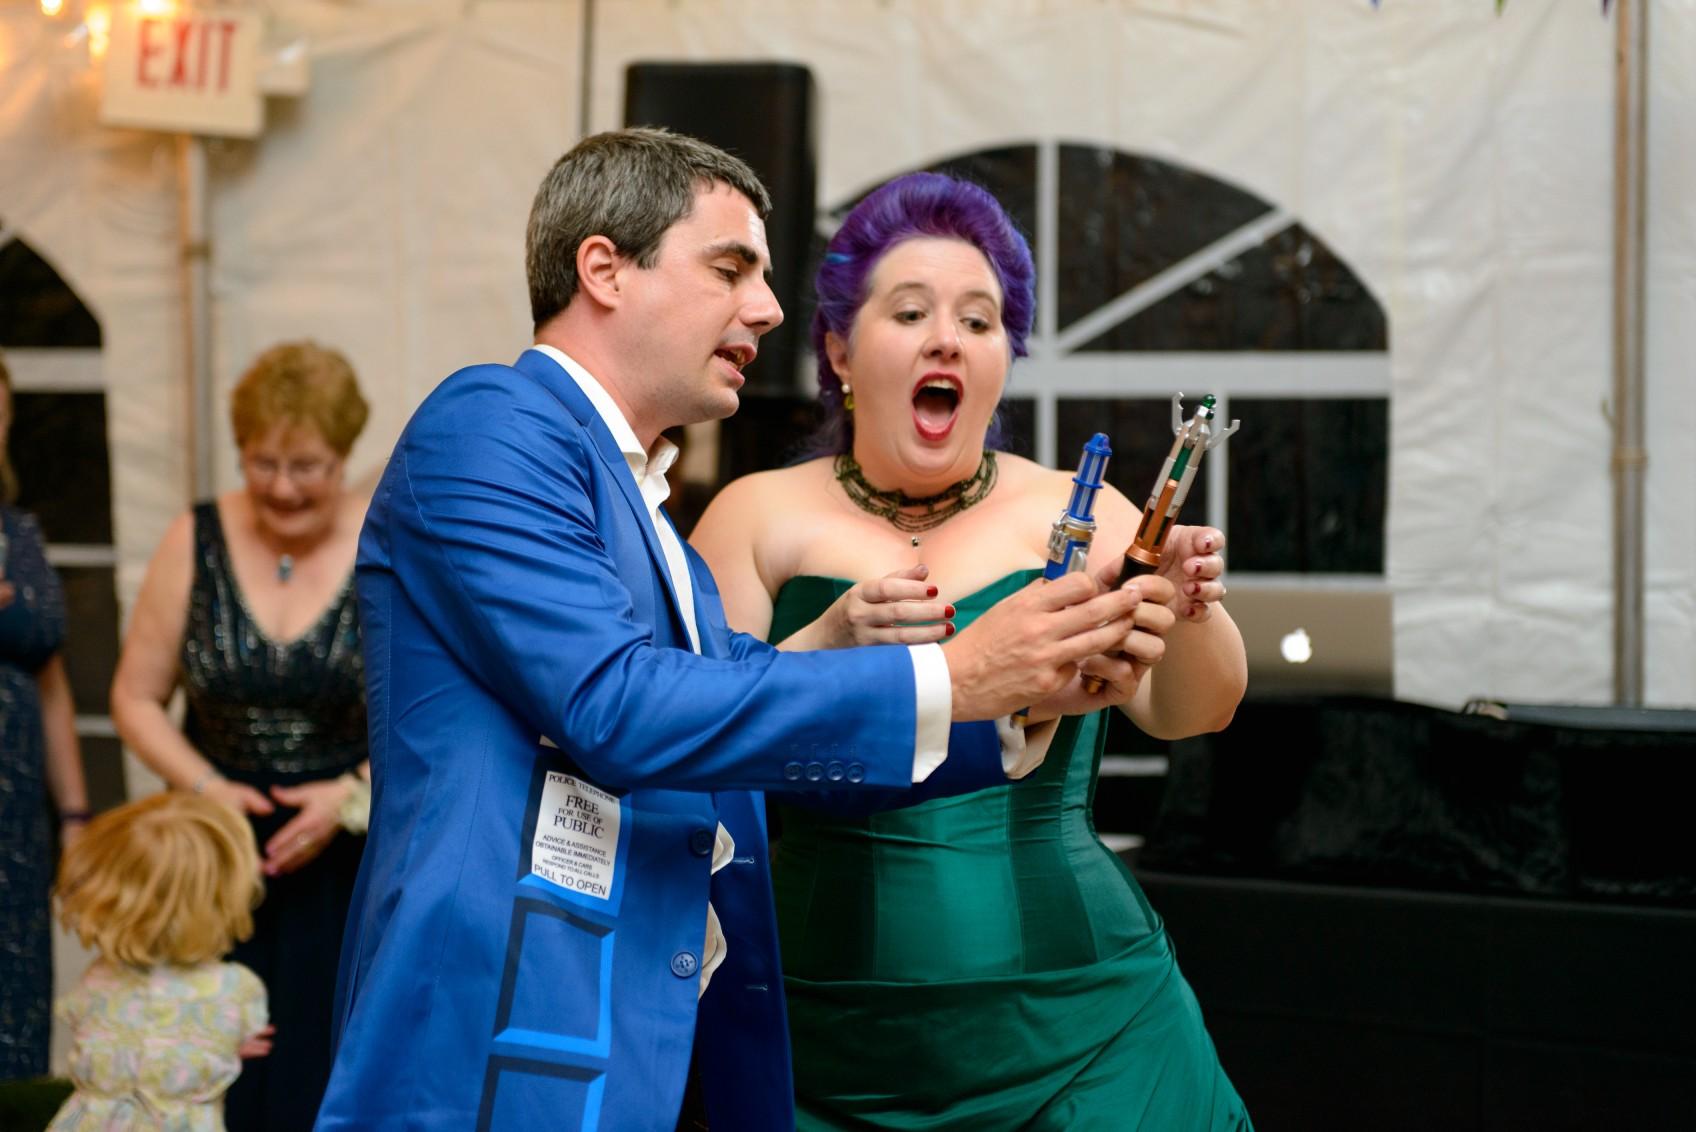 dr who wedding - tardis suit - wedding sonic screwdrivers - fun wedding ideas